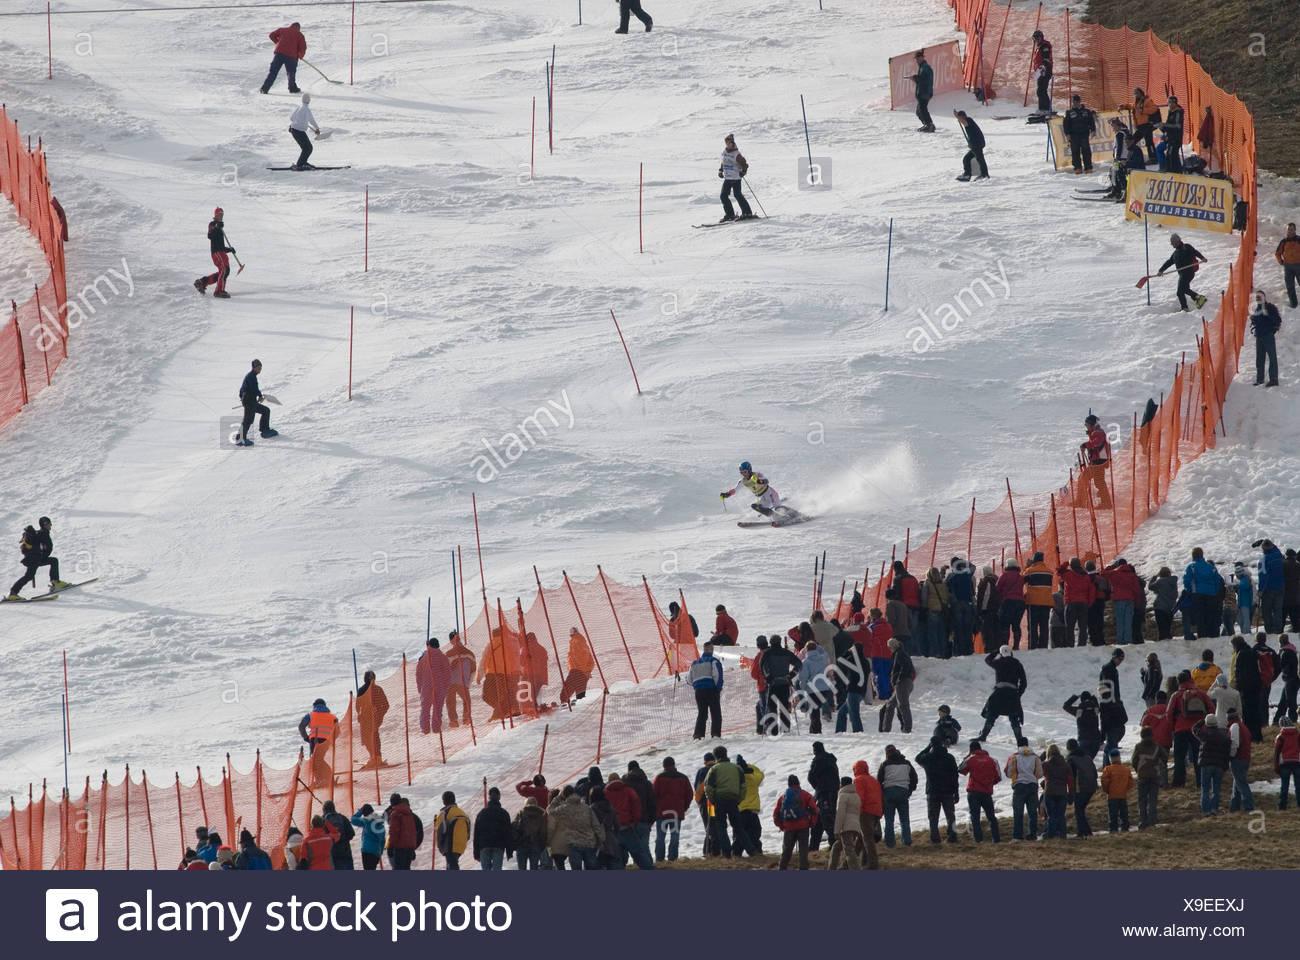 Benjamin Raich, Austria, FIS Ski Worldcup, Slalom men, Kandahar race, Garmisch-Partenkirchen, Bavaria, Germany - Stock Image